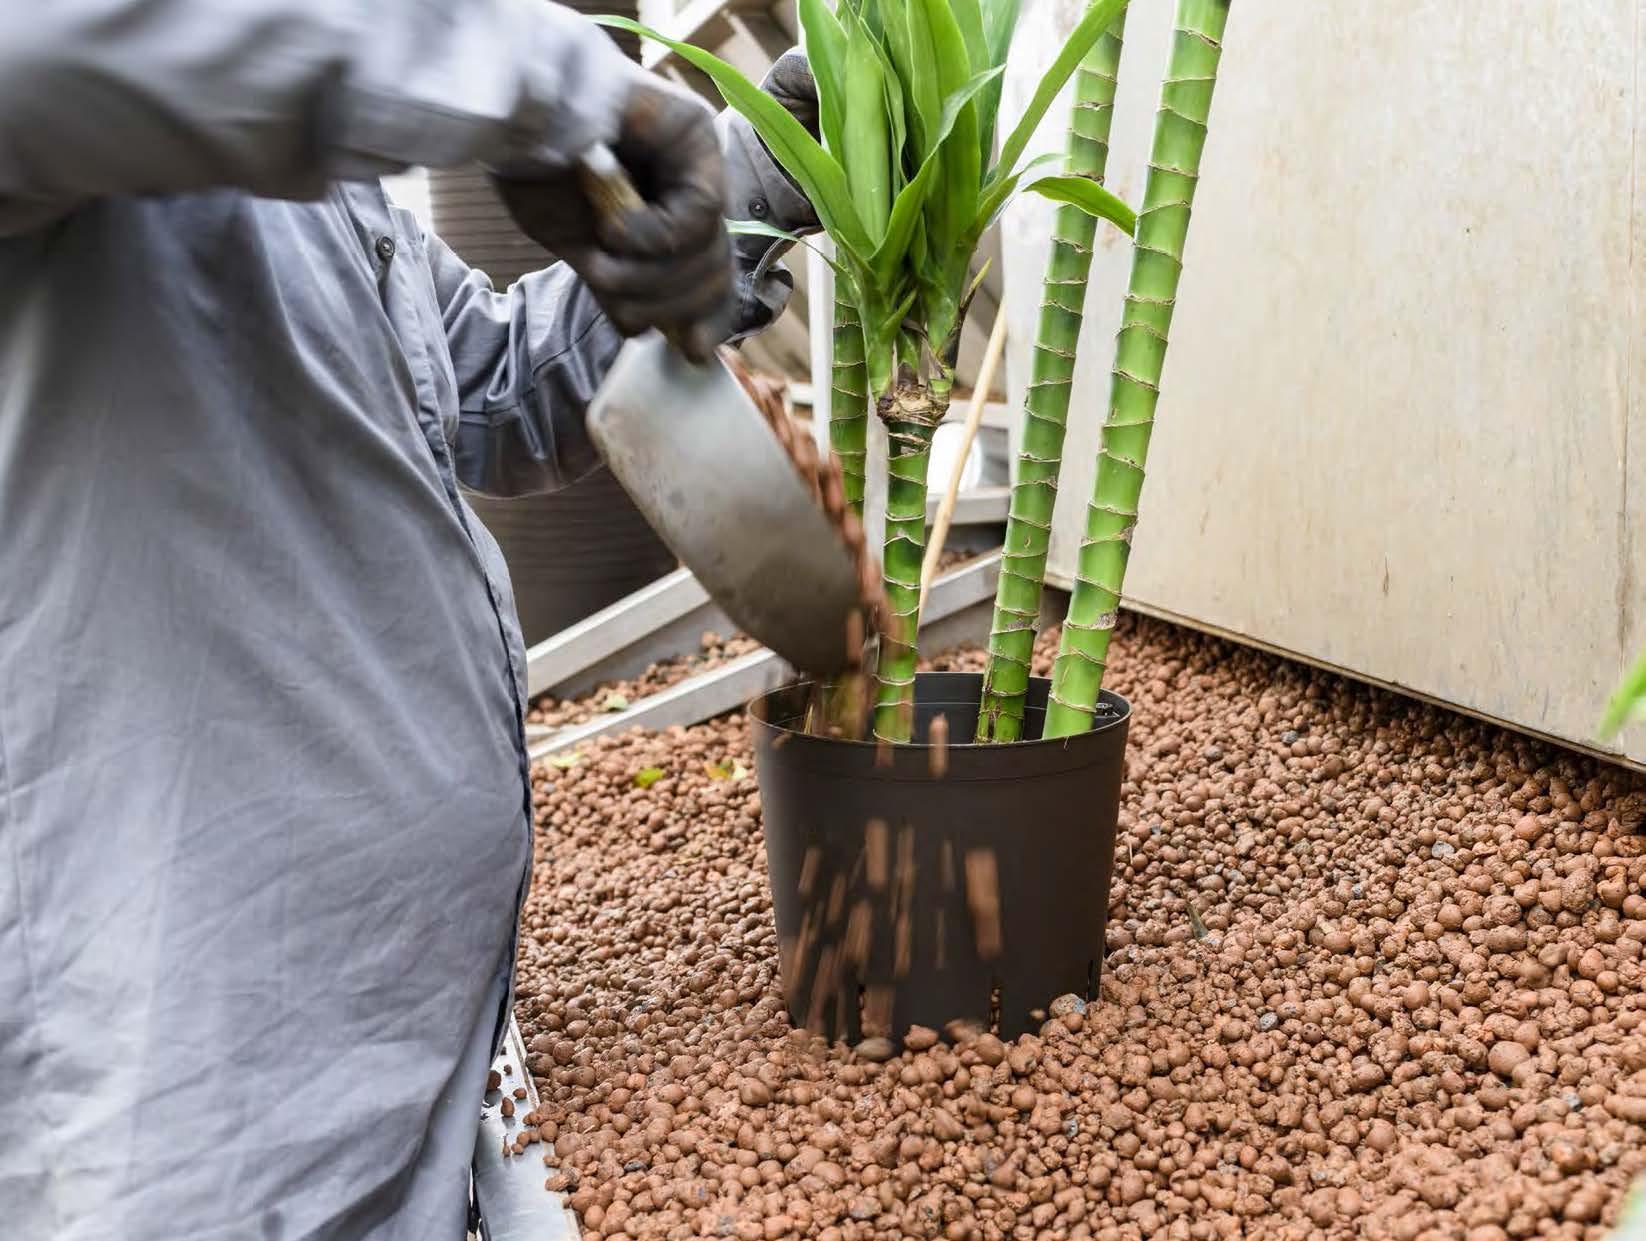 https://www.terrapalme.de/media/images/Blaehton-Hydrokultur-Pflanzen.jpg